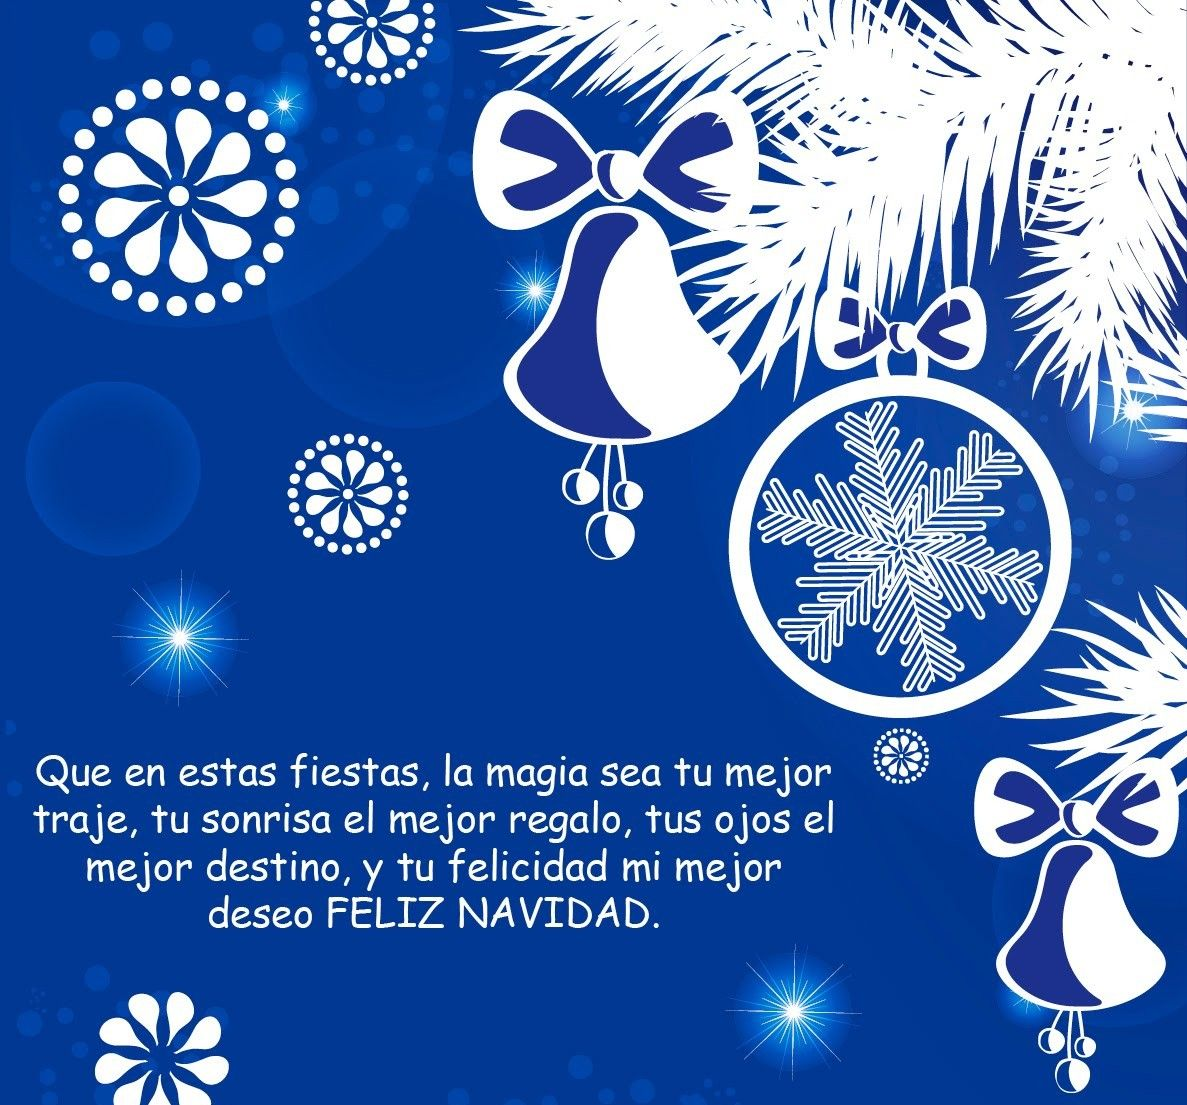 Mensajes navide os tarjetas de navidad pinterest - Postales de navidad bonitas ...